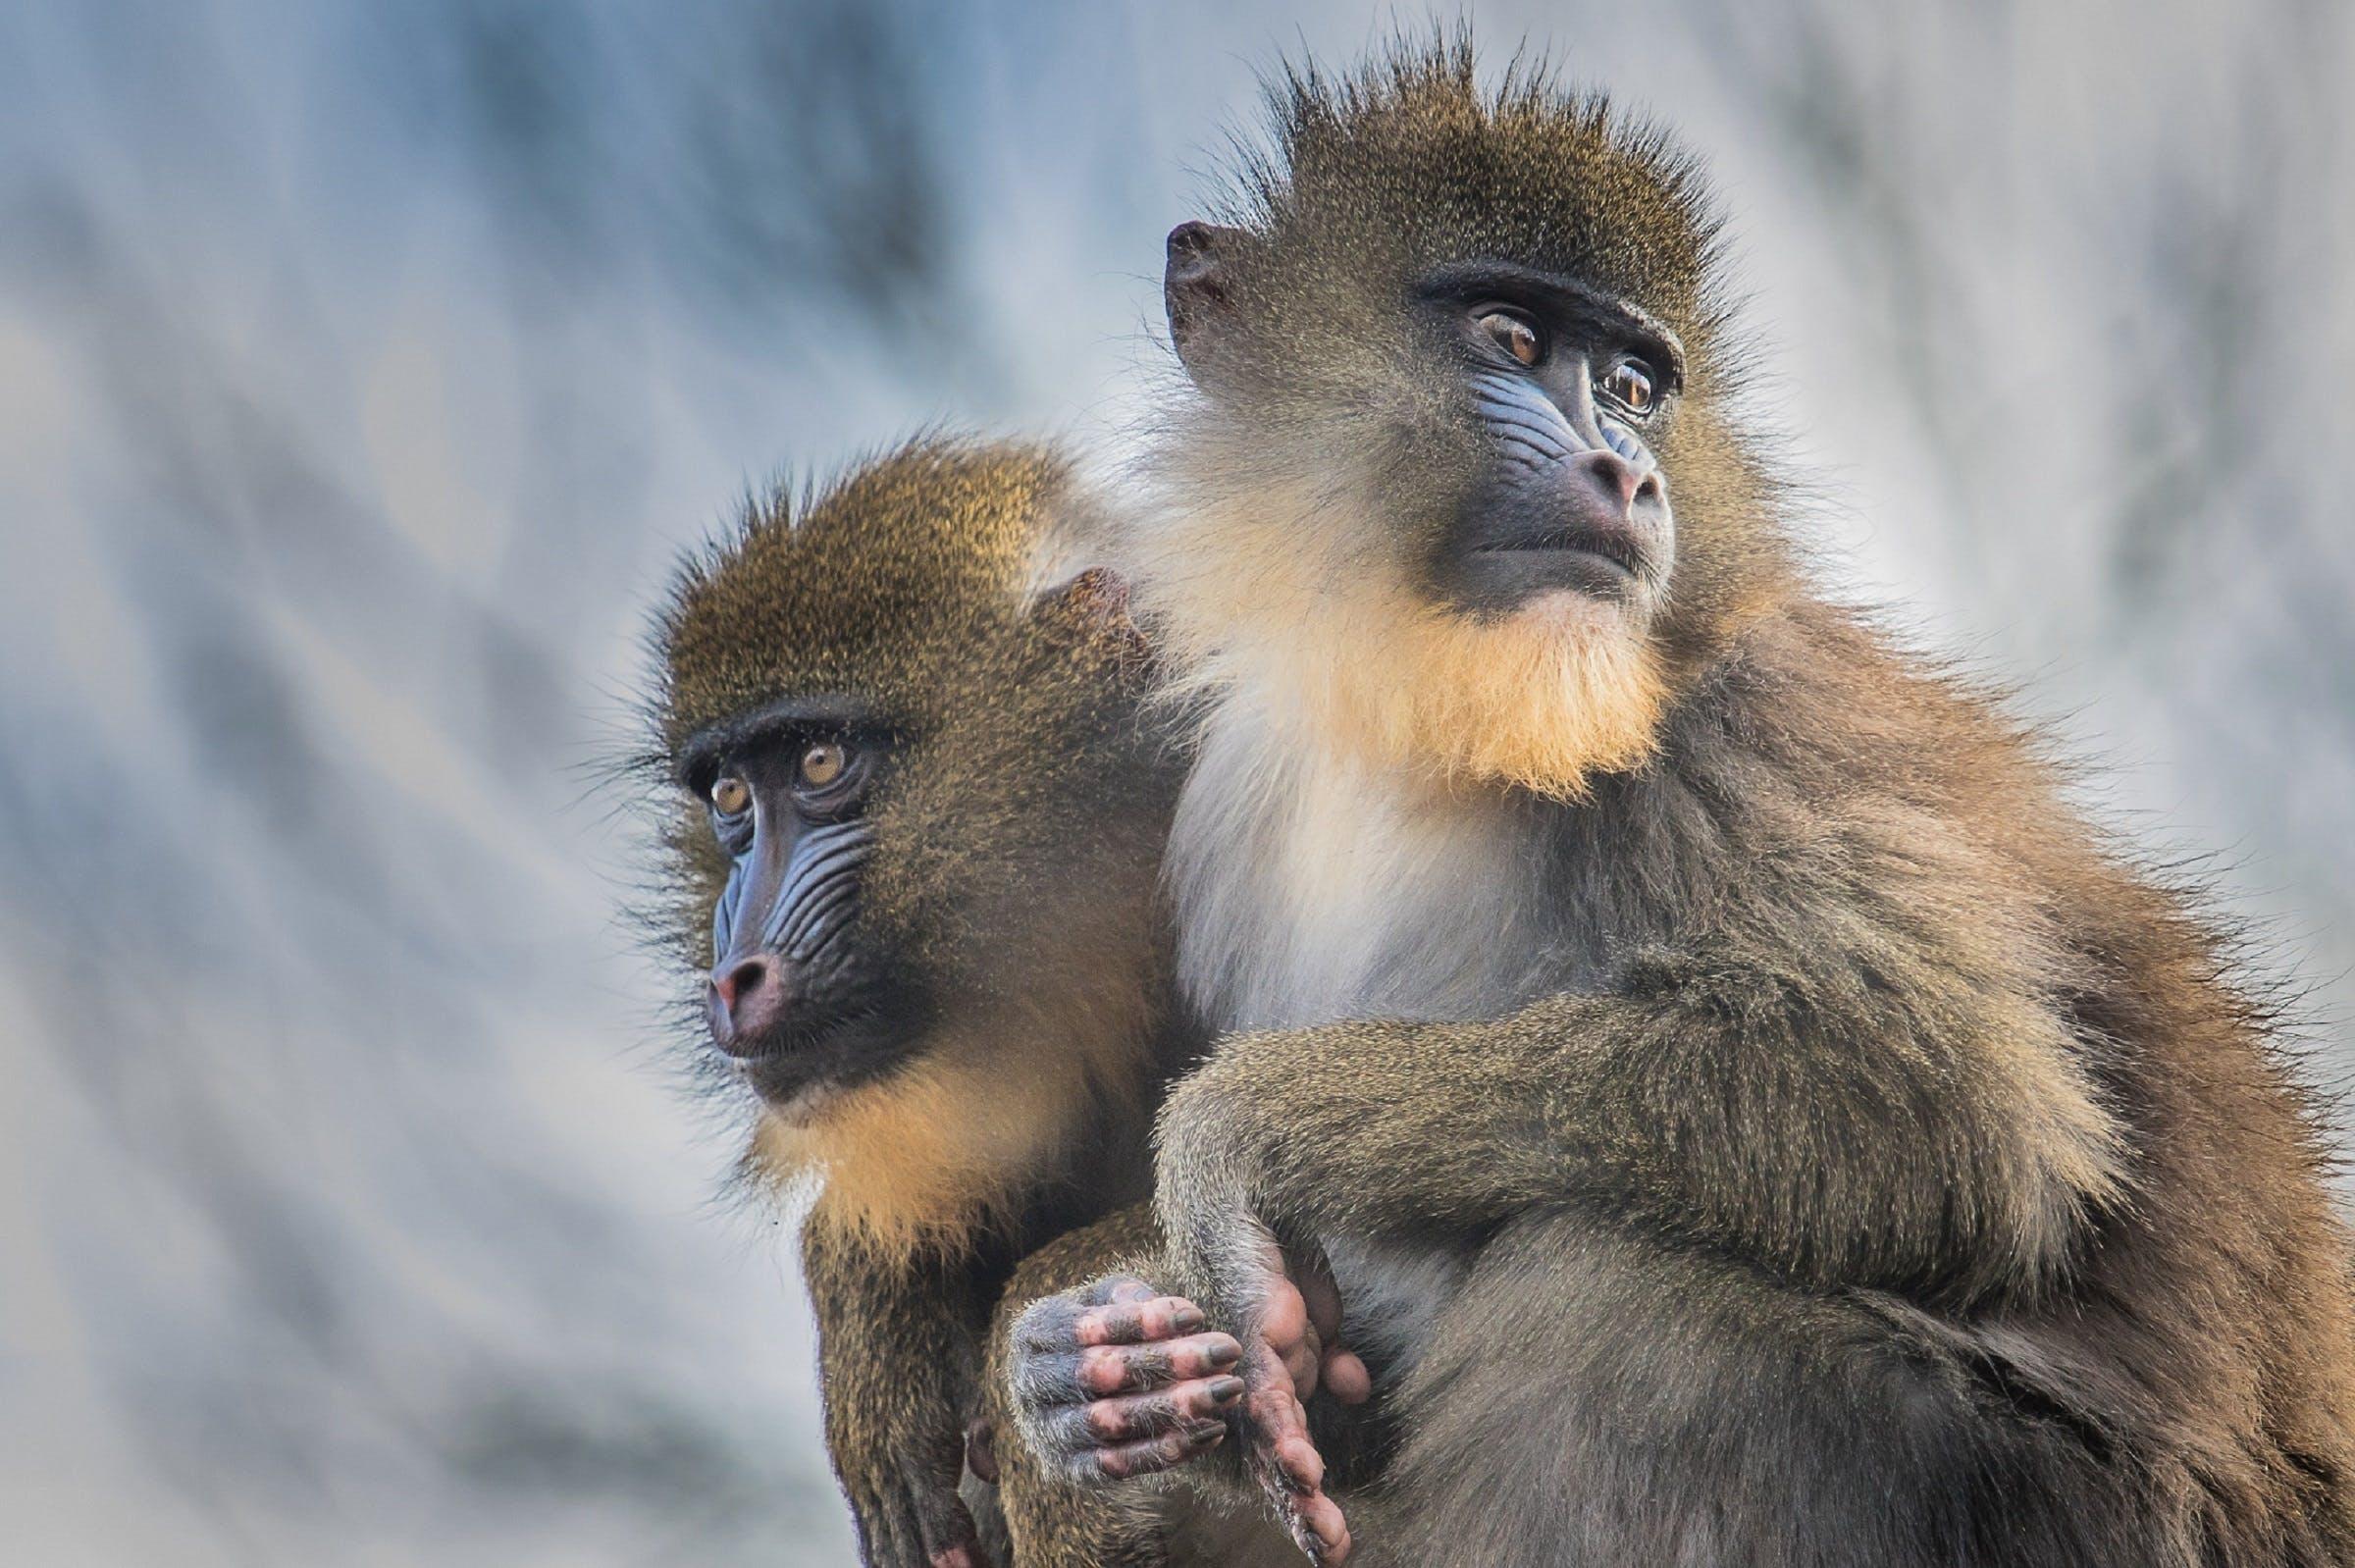 Gratis arkivbilde med ape, apekatt, apekatter, dyr